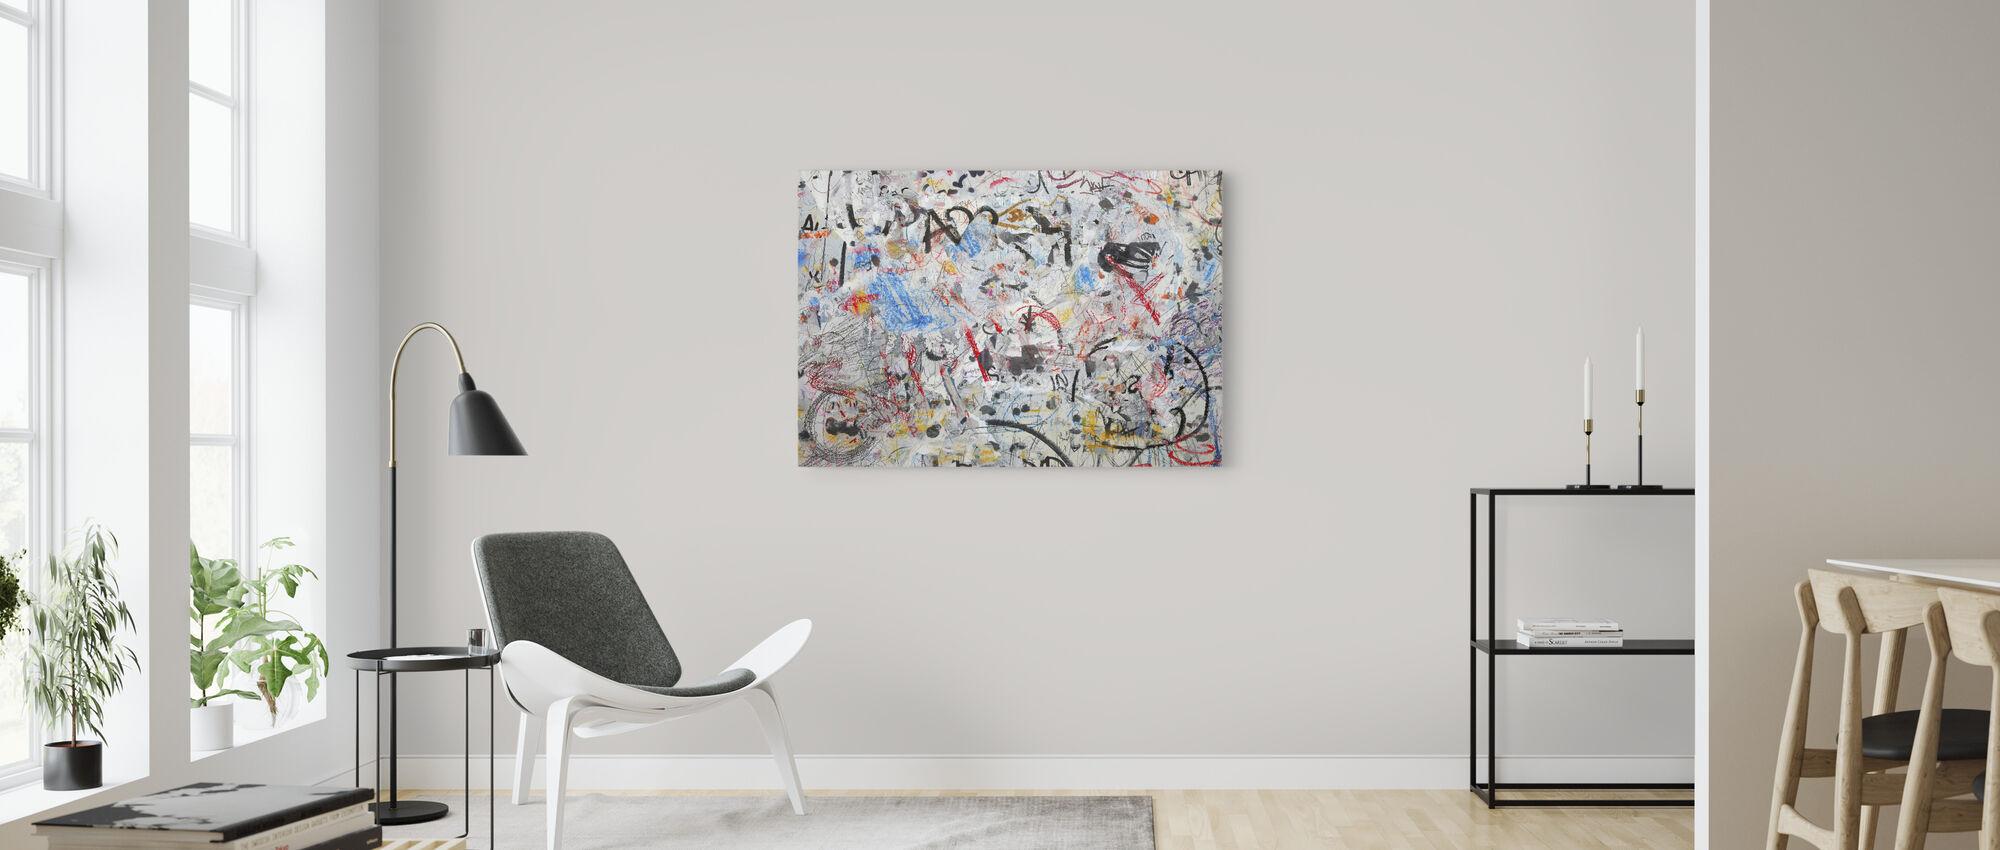 Grunge Graffiti Wall - Canvas print - Living Room